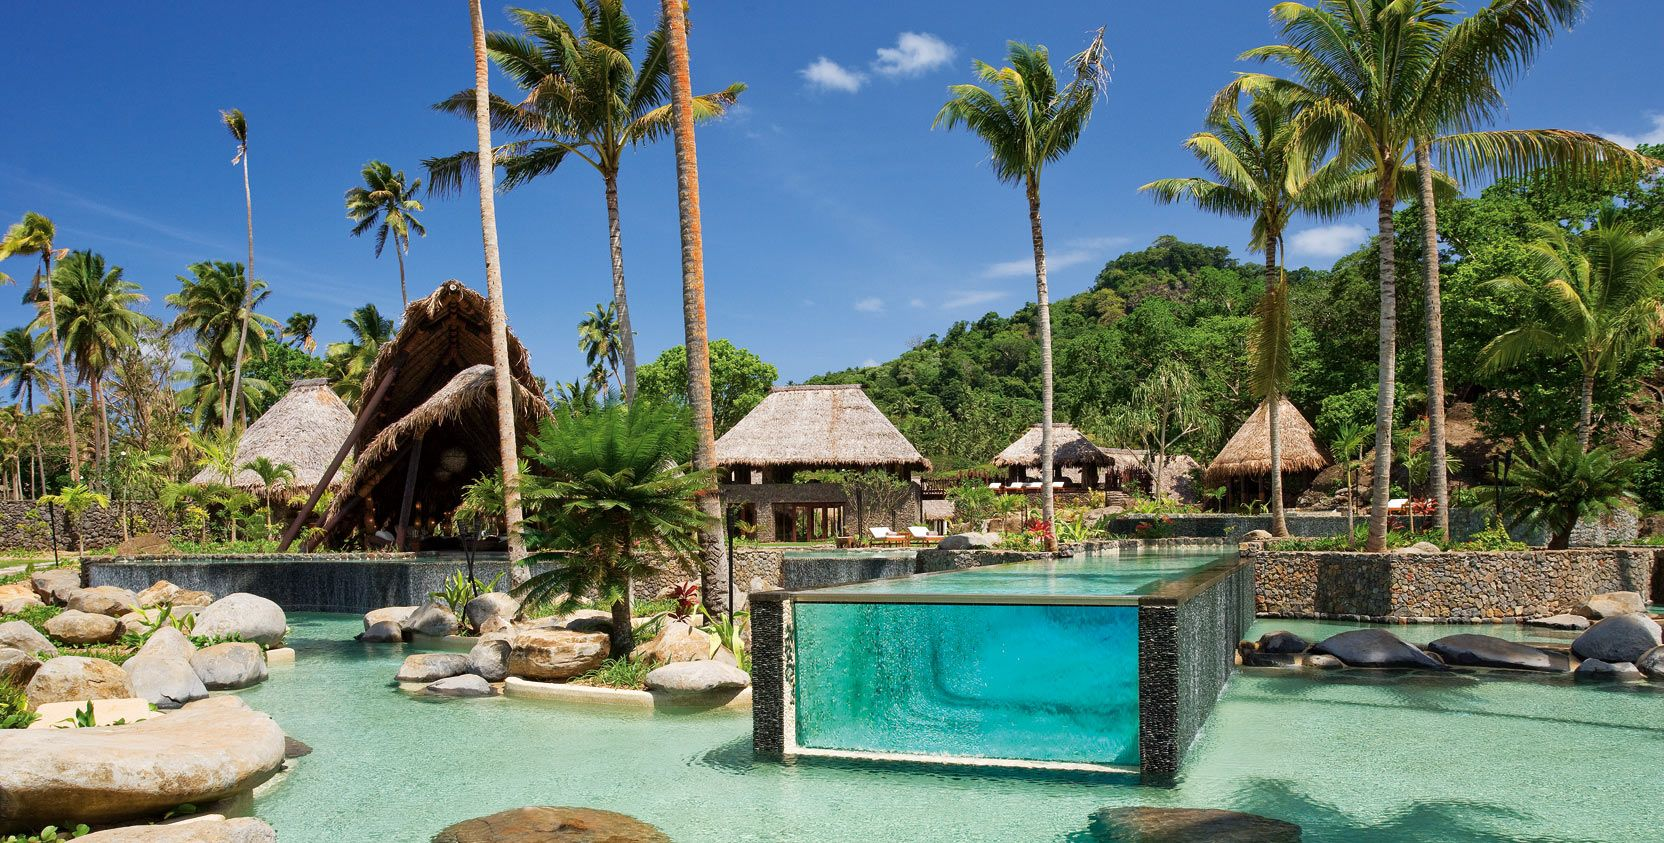 Luxury Escapes at Laucala Island Fiji - Lavish Hotels and Resorts